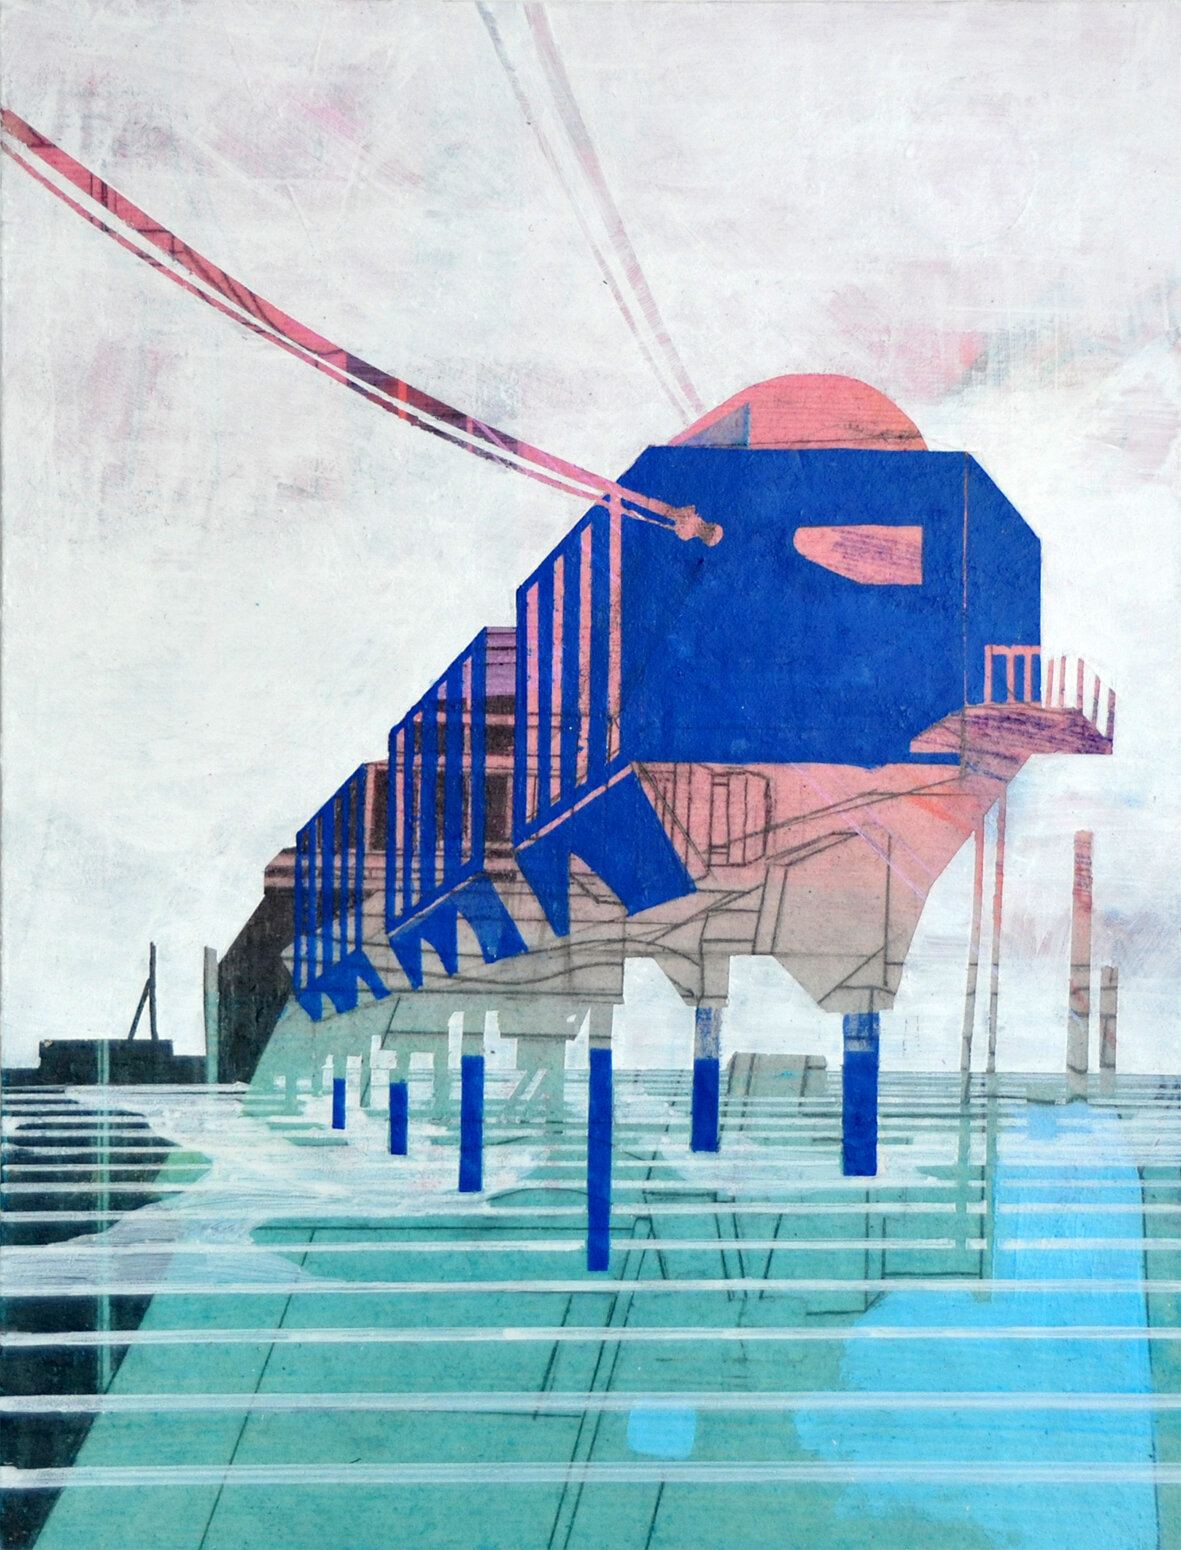 Susanne Wurlitzer Halley VI Station, 2019 Pencil, colored pencil, felt-tip pen, acrylic, on cardboard 25 x 19 cm